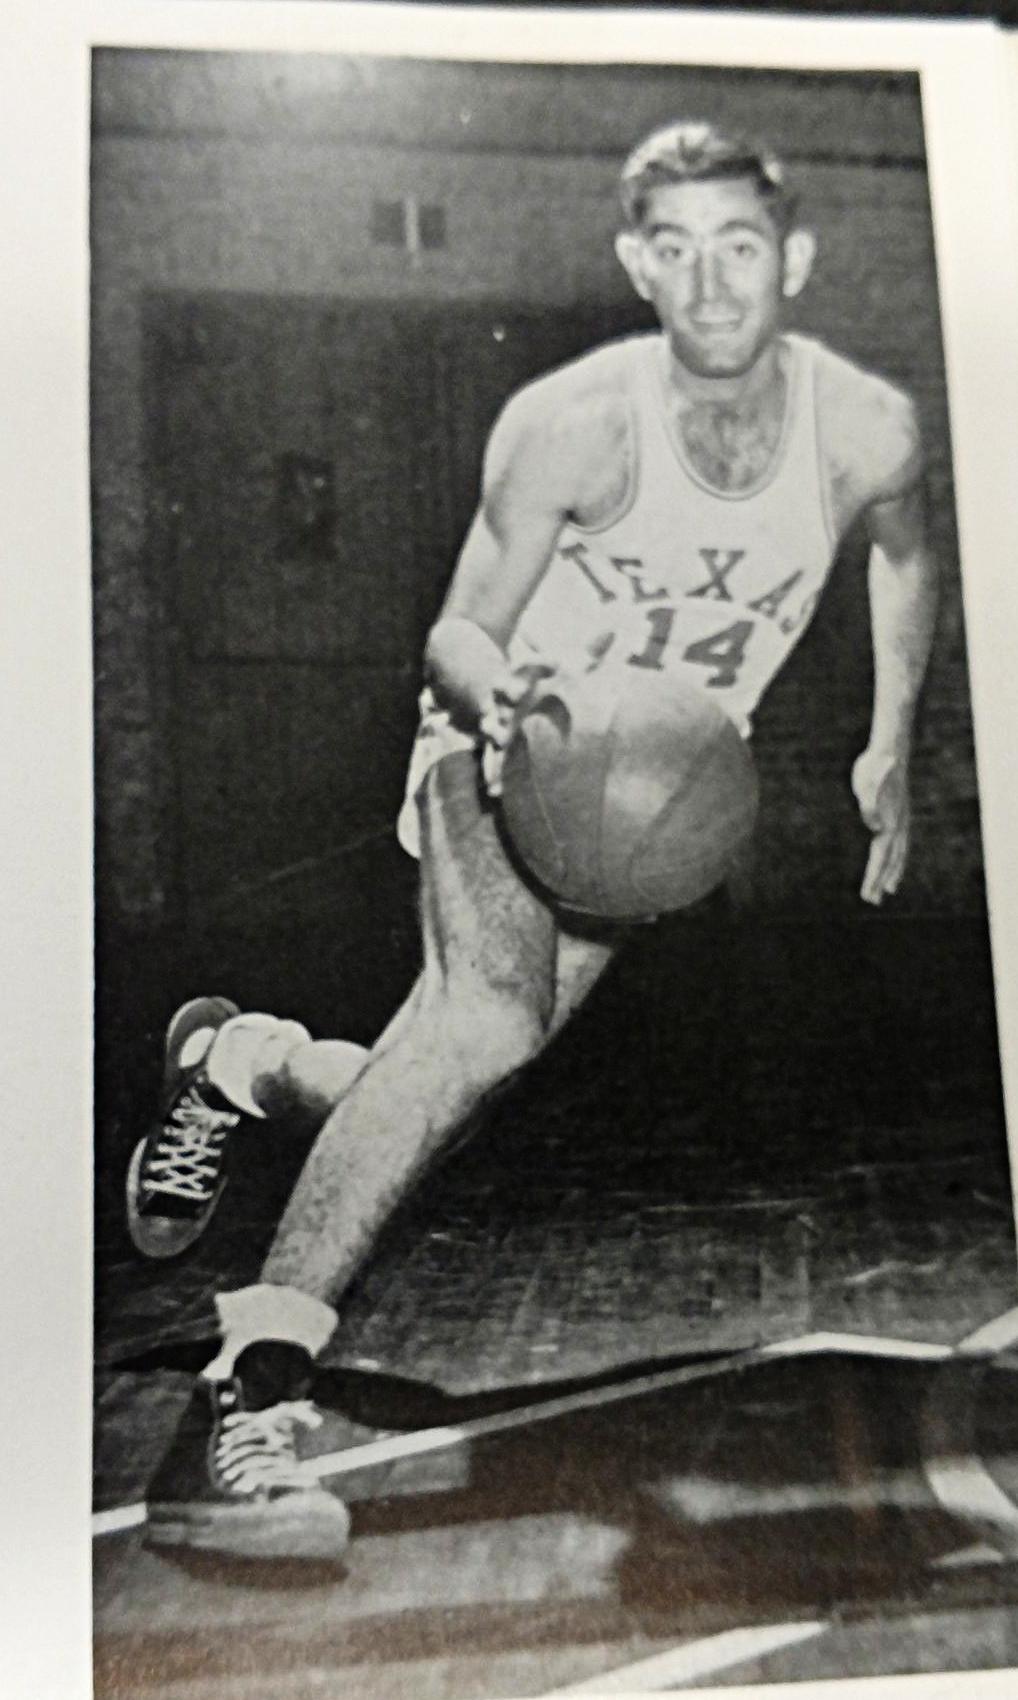 Sidney Zomlefer